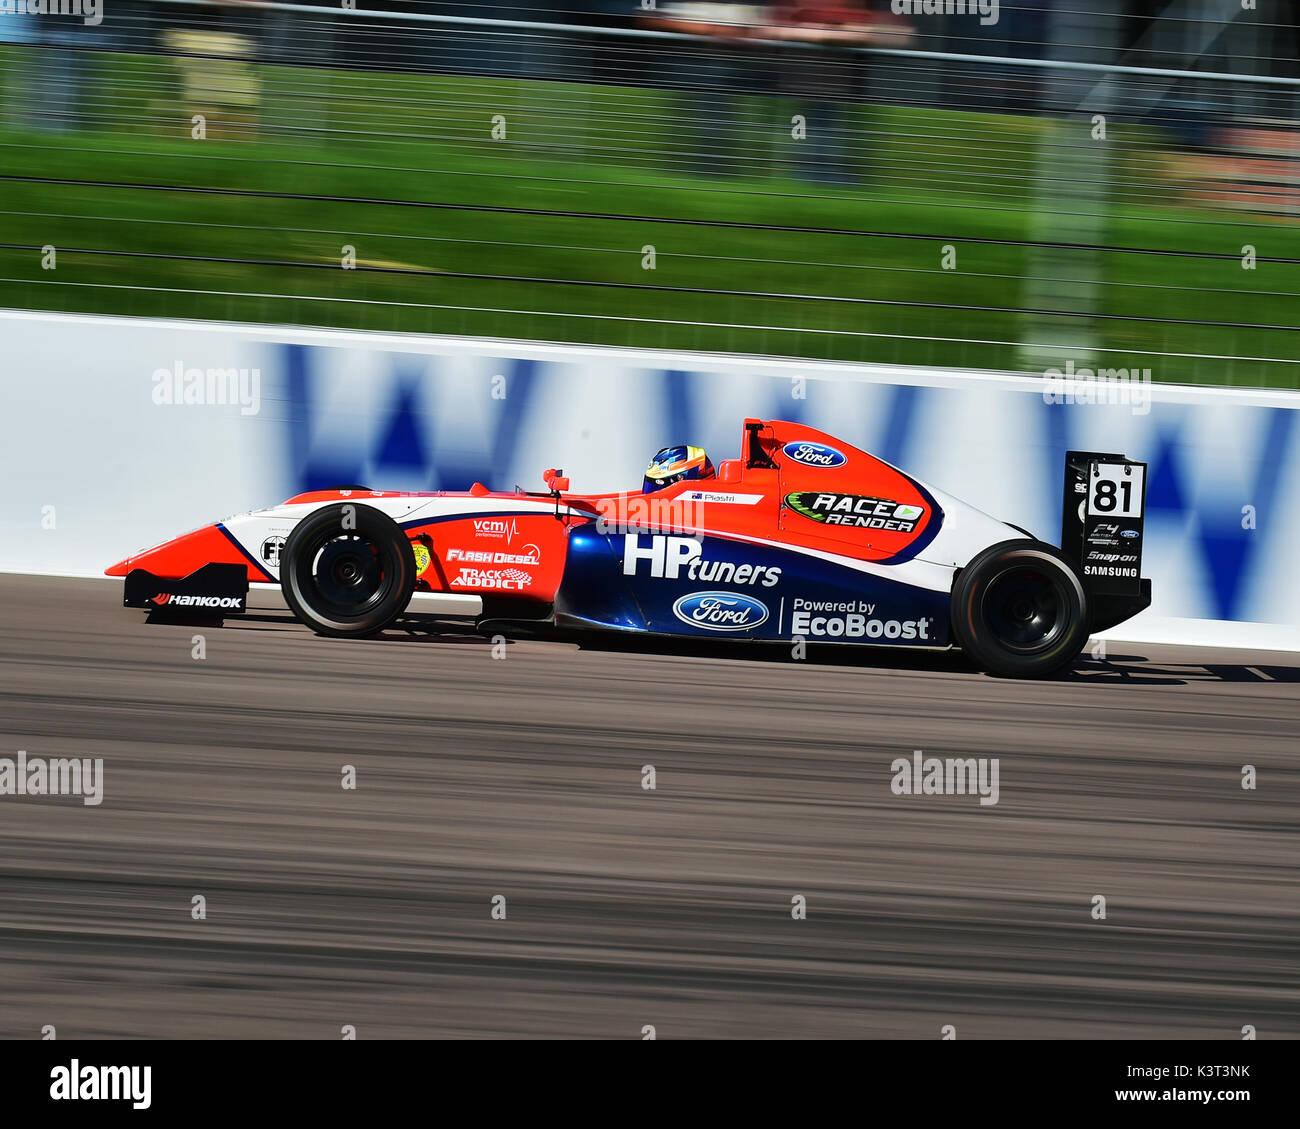 Arden Motorsport Stock Photos & Arden Motorsport Stock